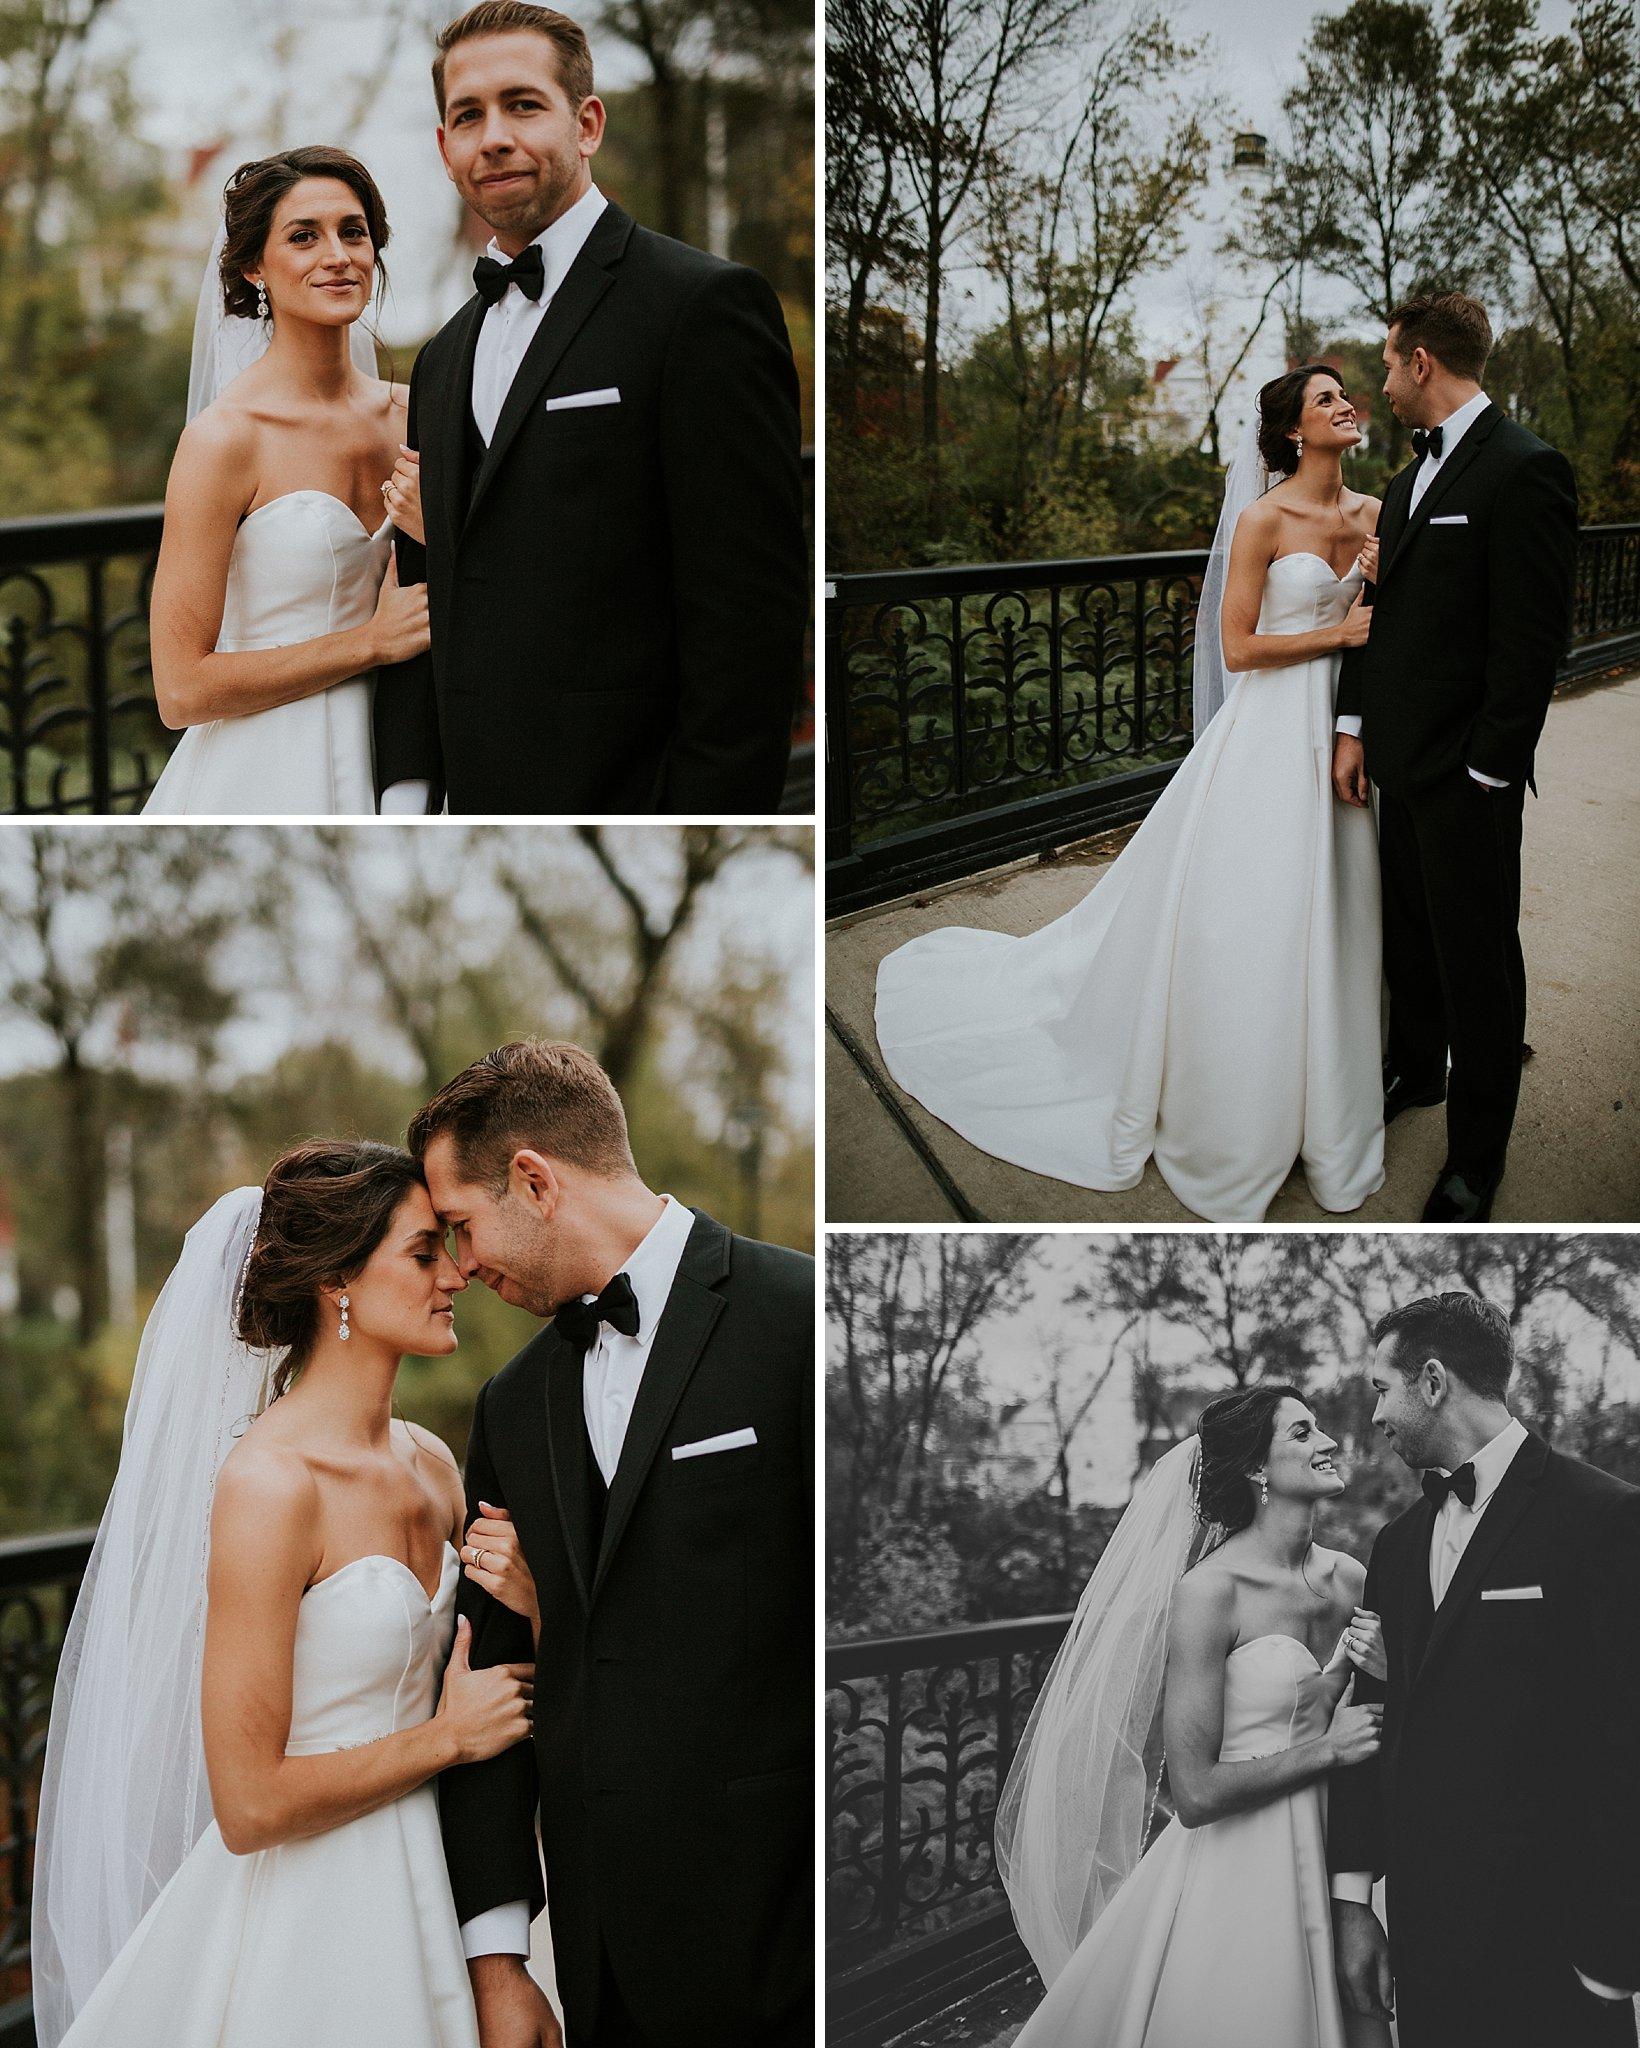 Matt-Lauren_St-Marys_Hilton-City-Center-Milwaukee-Wedding_liller-photo_0040.jpg